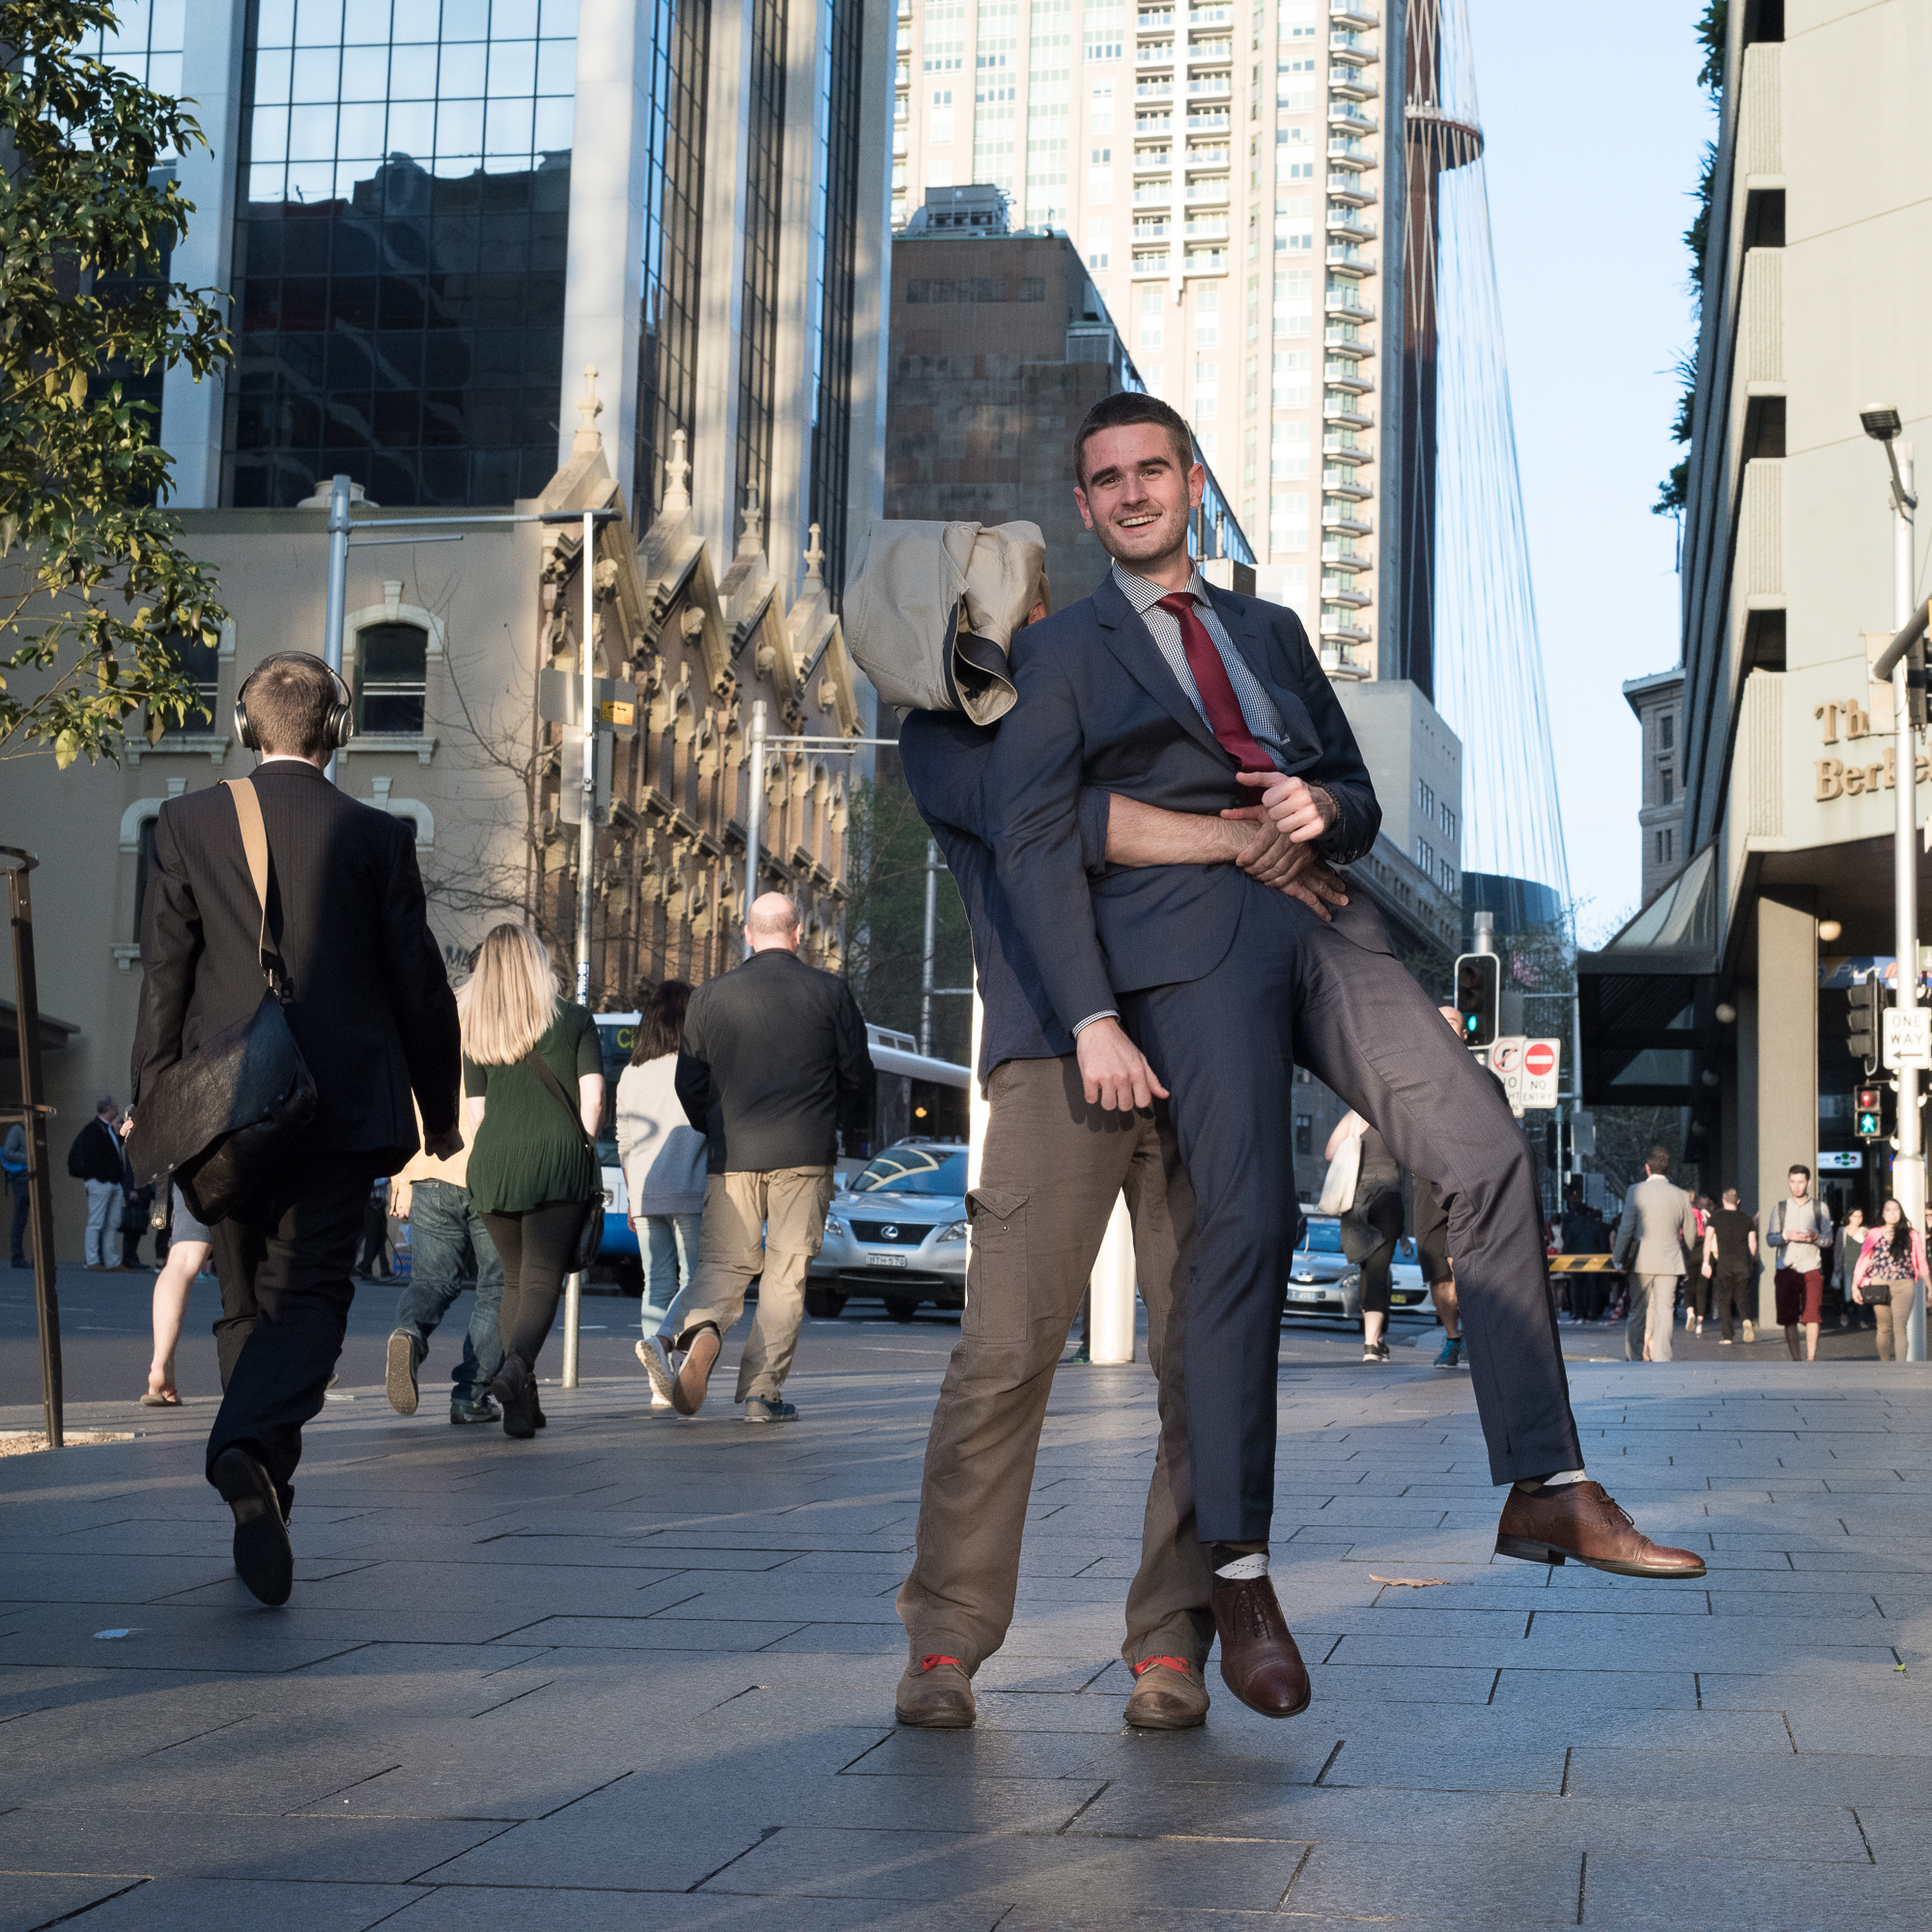 Street Sydney - With elegant headphone